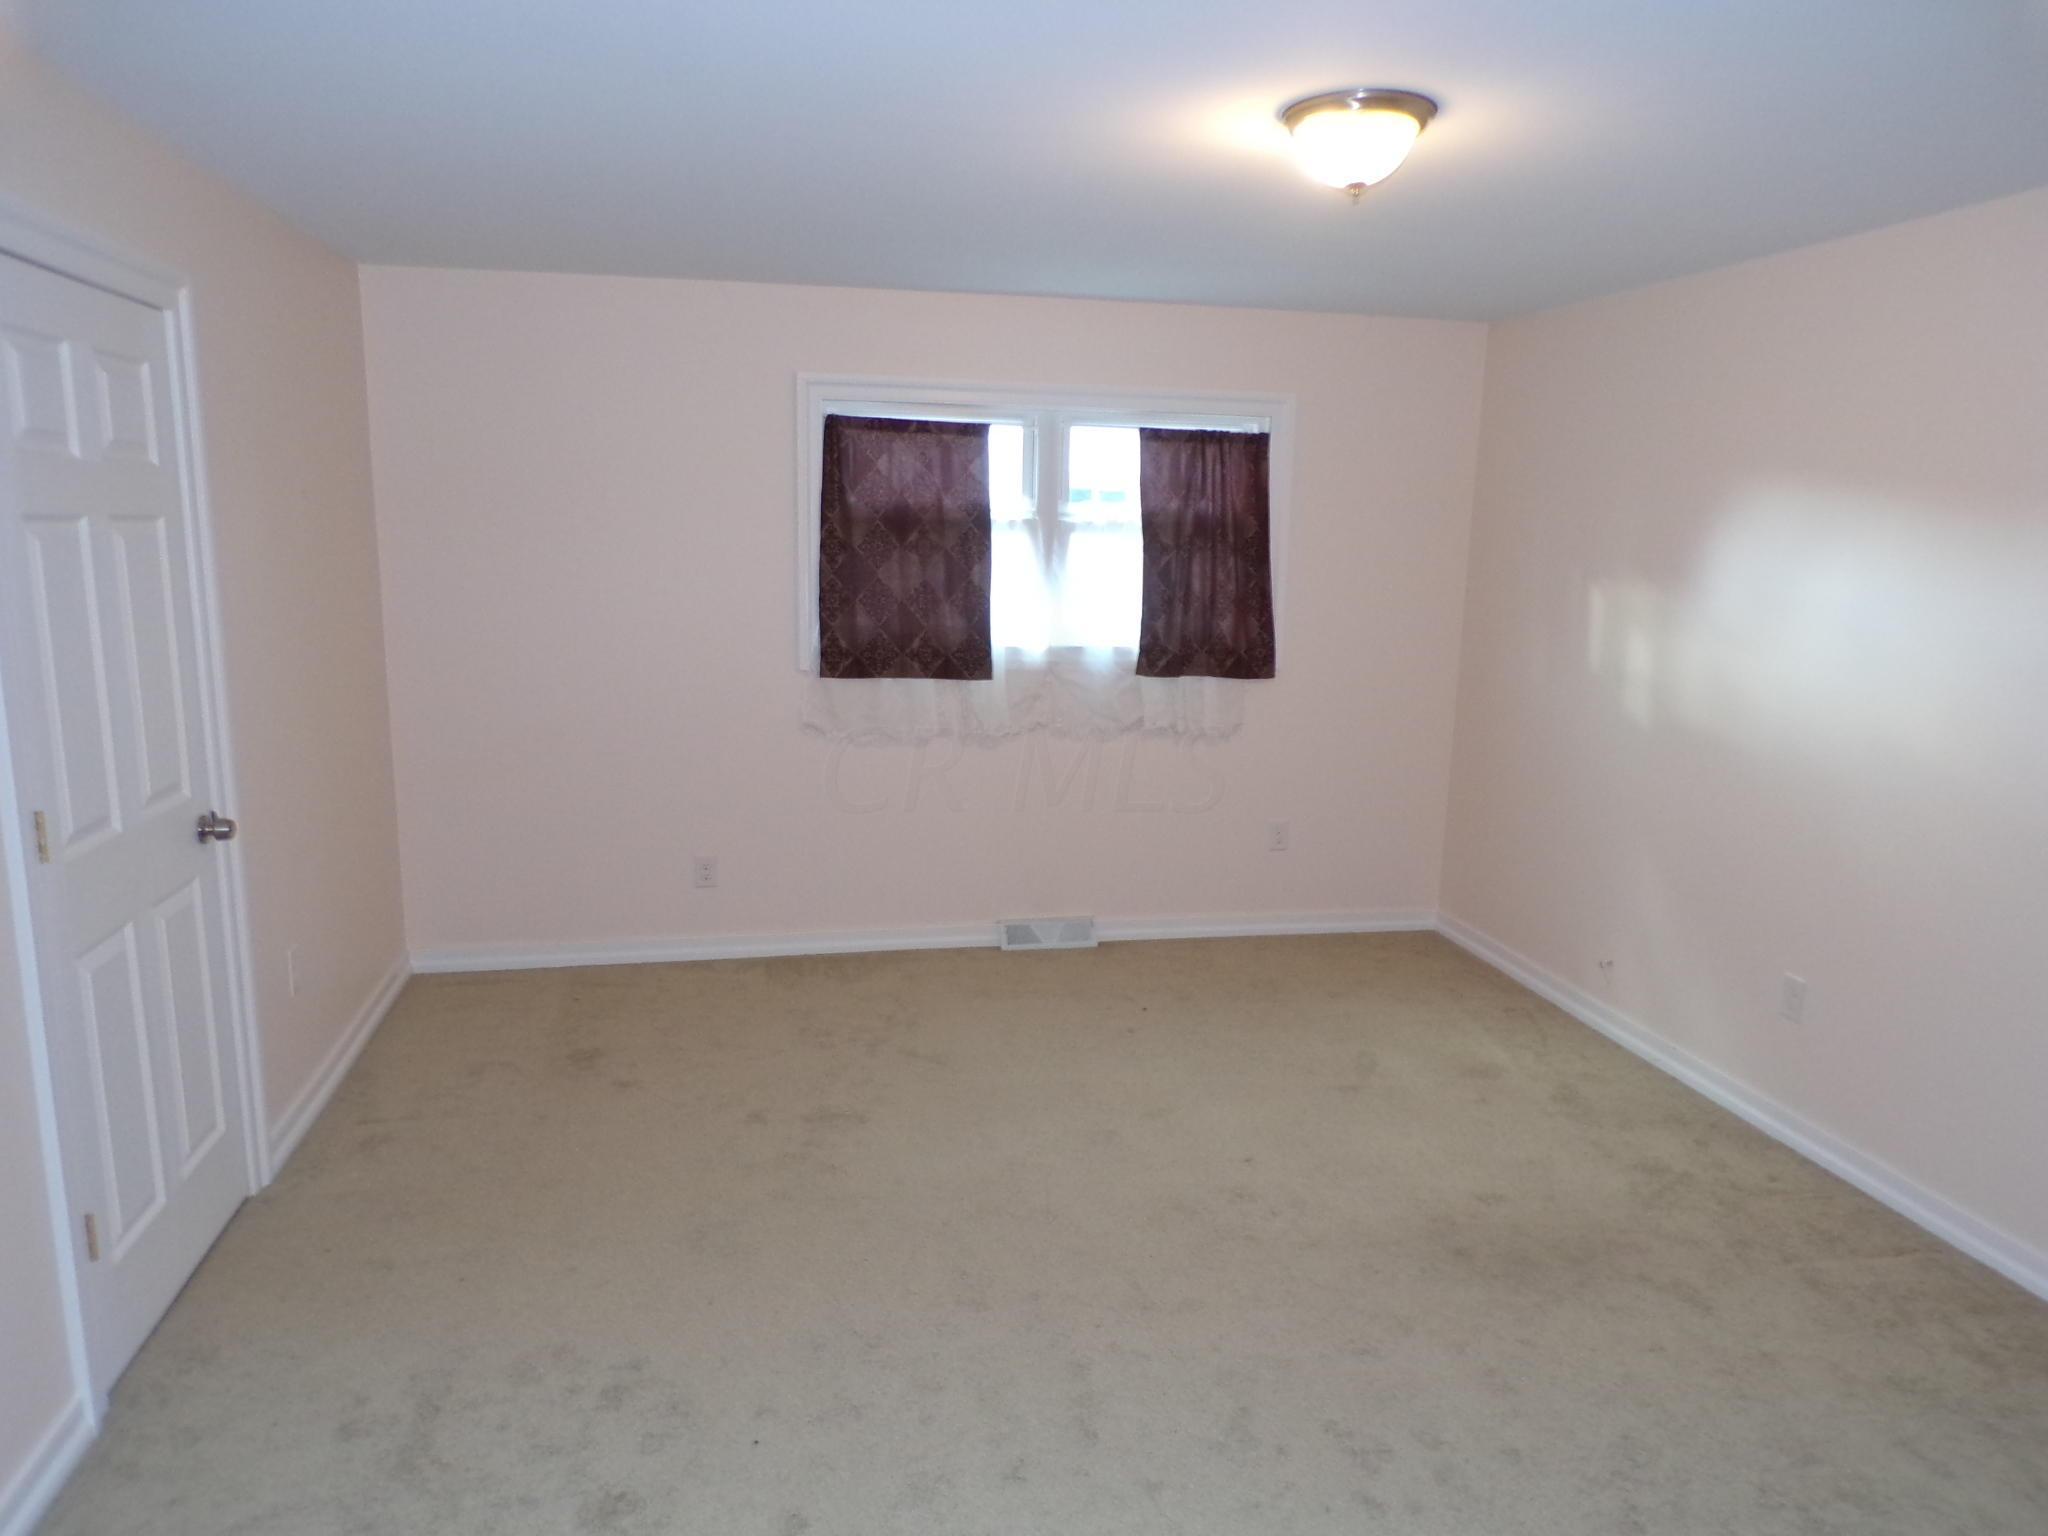 6285 Feder Road, Columbus, Ohio 43228, 2 Bedrooms Bedrooms, ,2 BathroomsBathrooms,Residential,For Sale,Feder,221000641